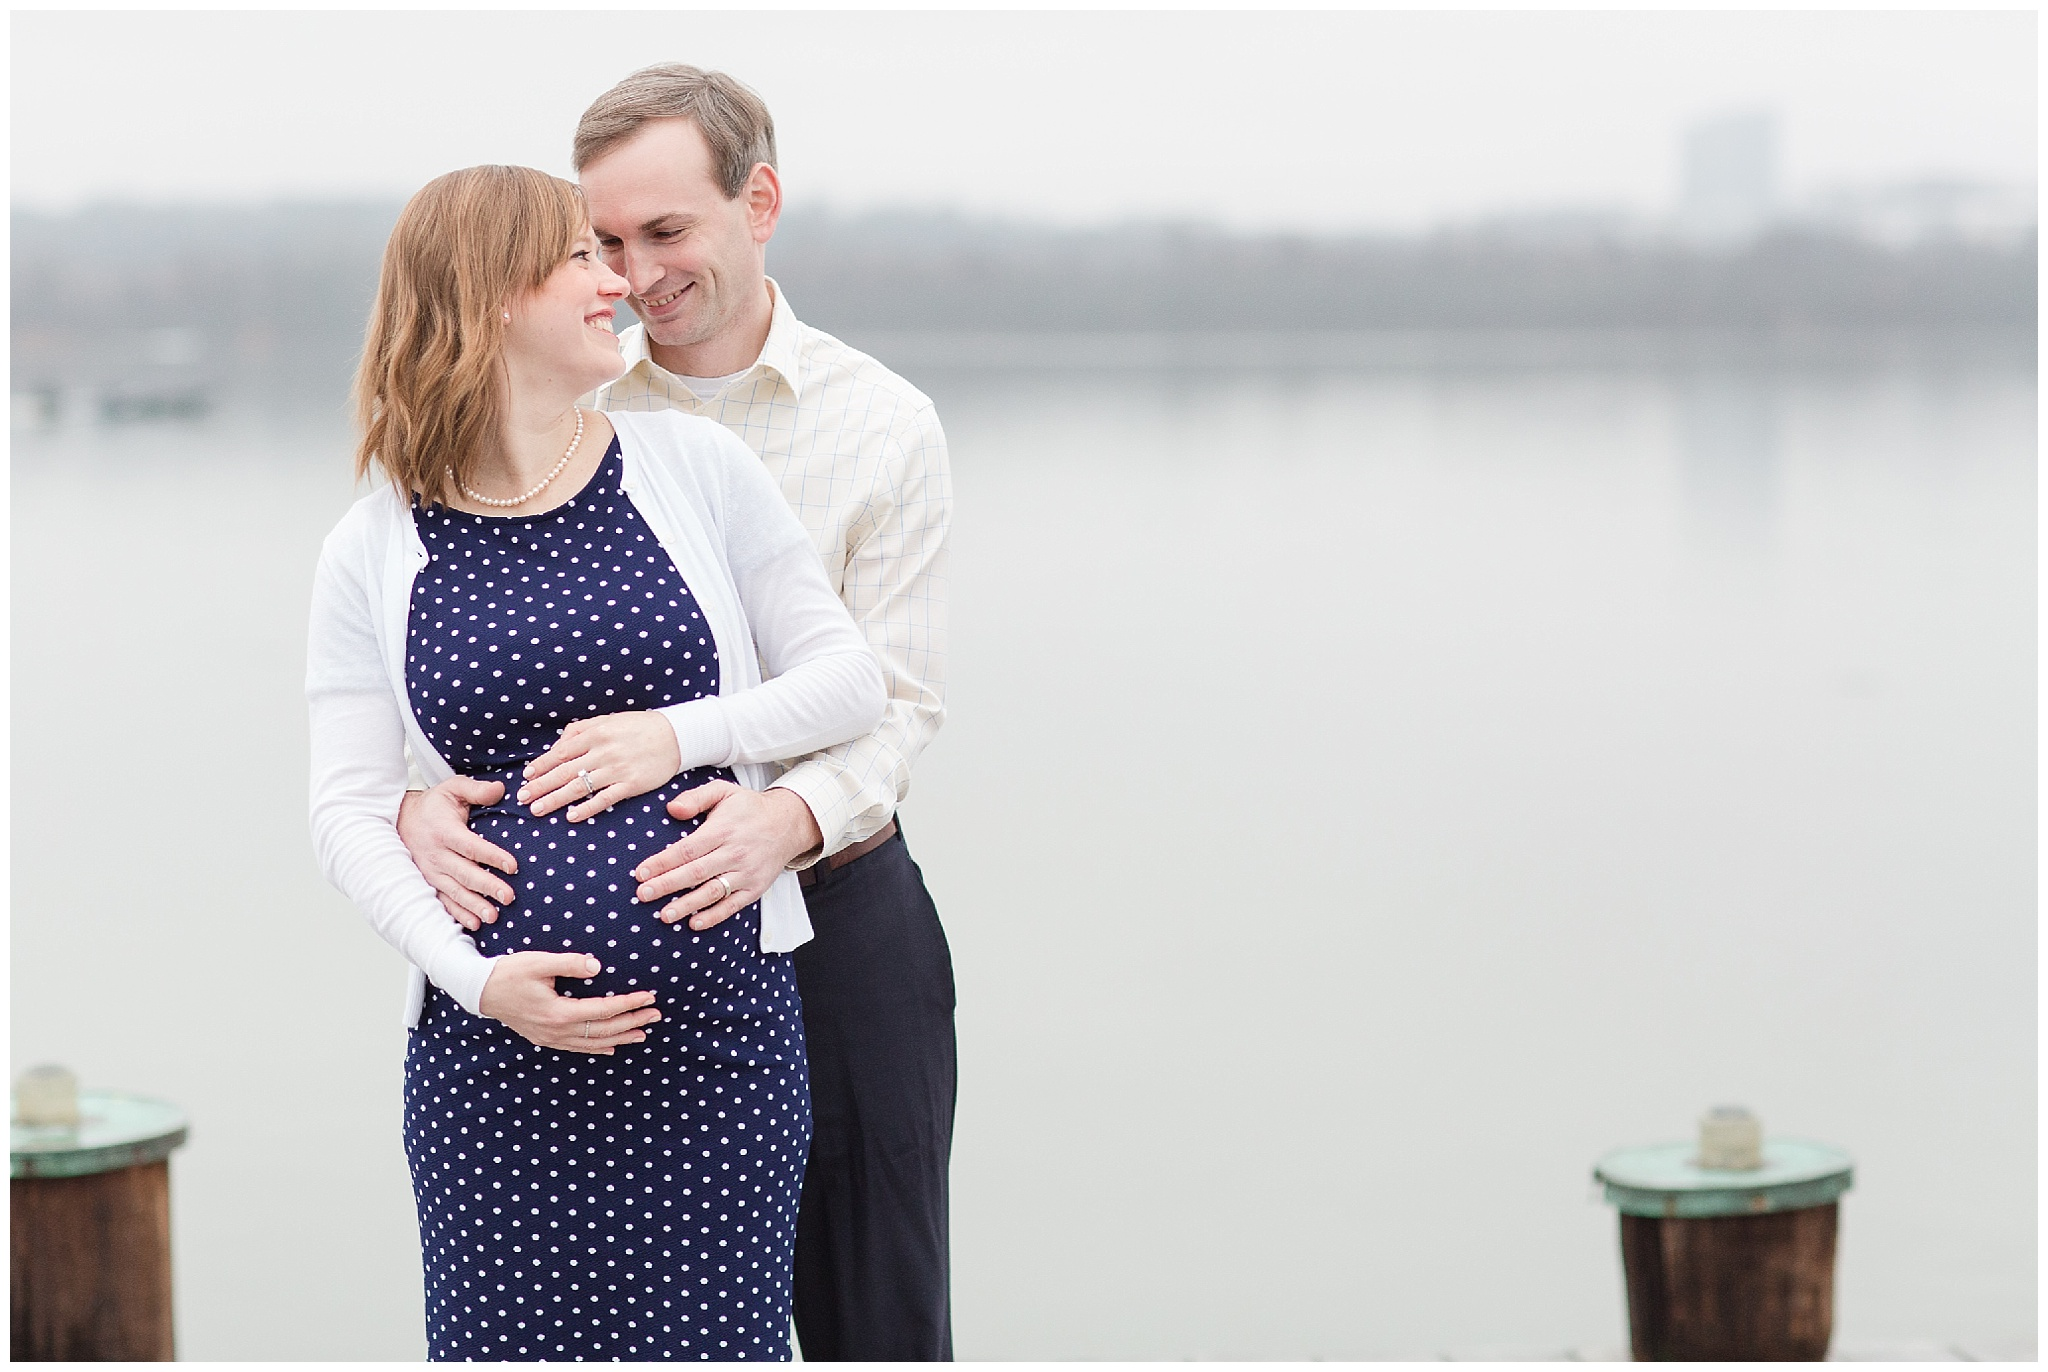 hoynak_maternity_0008.jpg